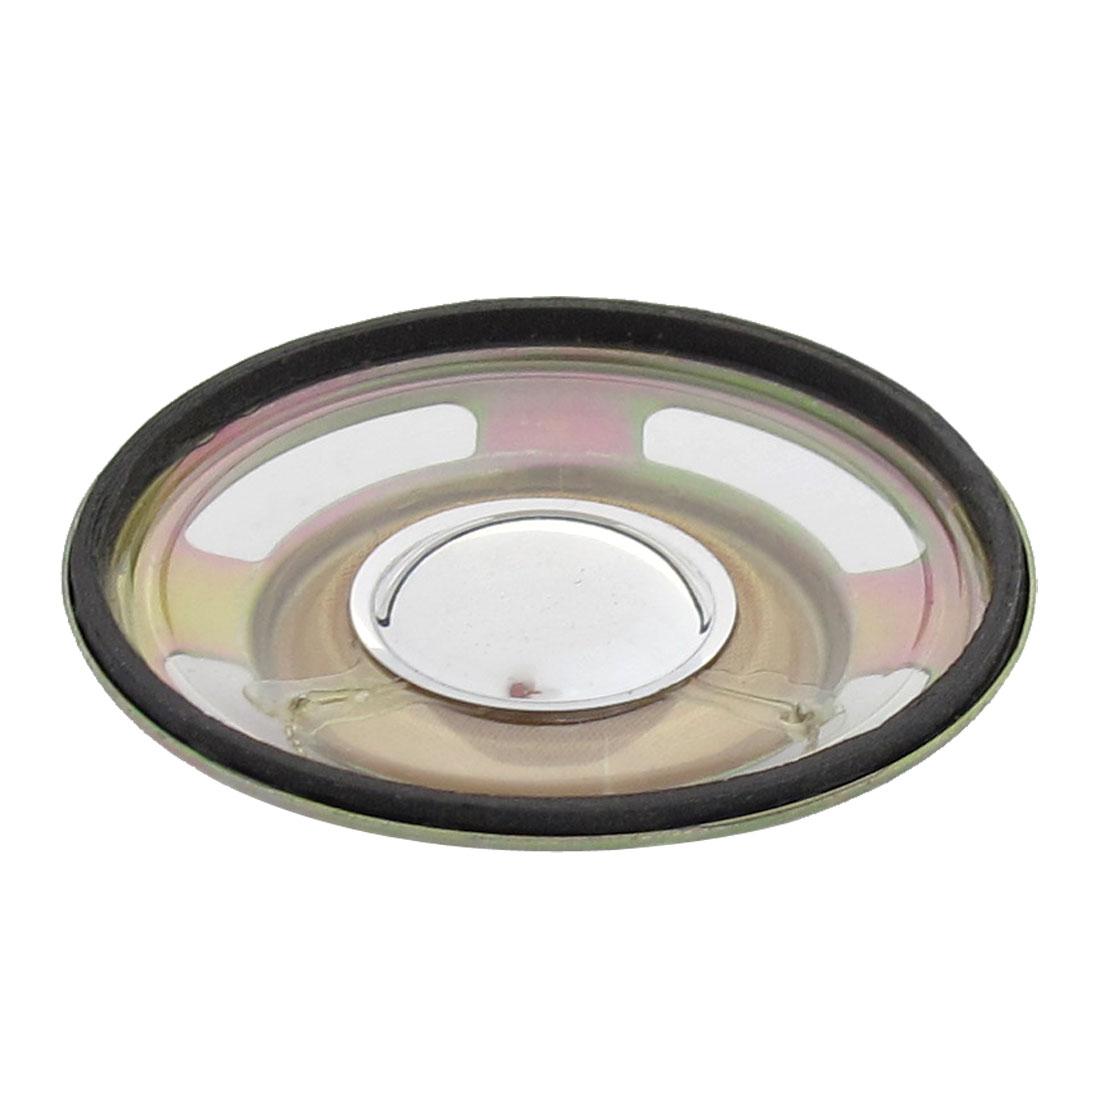 3W 4 Ohm Aluminum Housing Waterproof Internal Magnet Speaker 50mm Dia